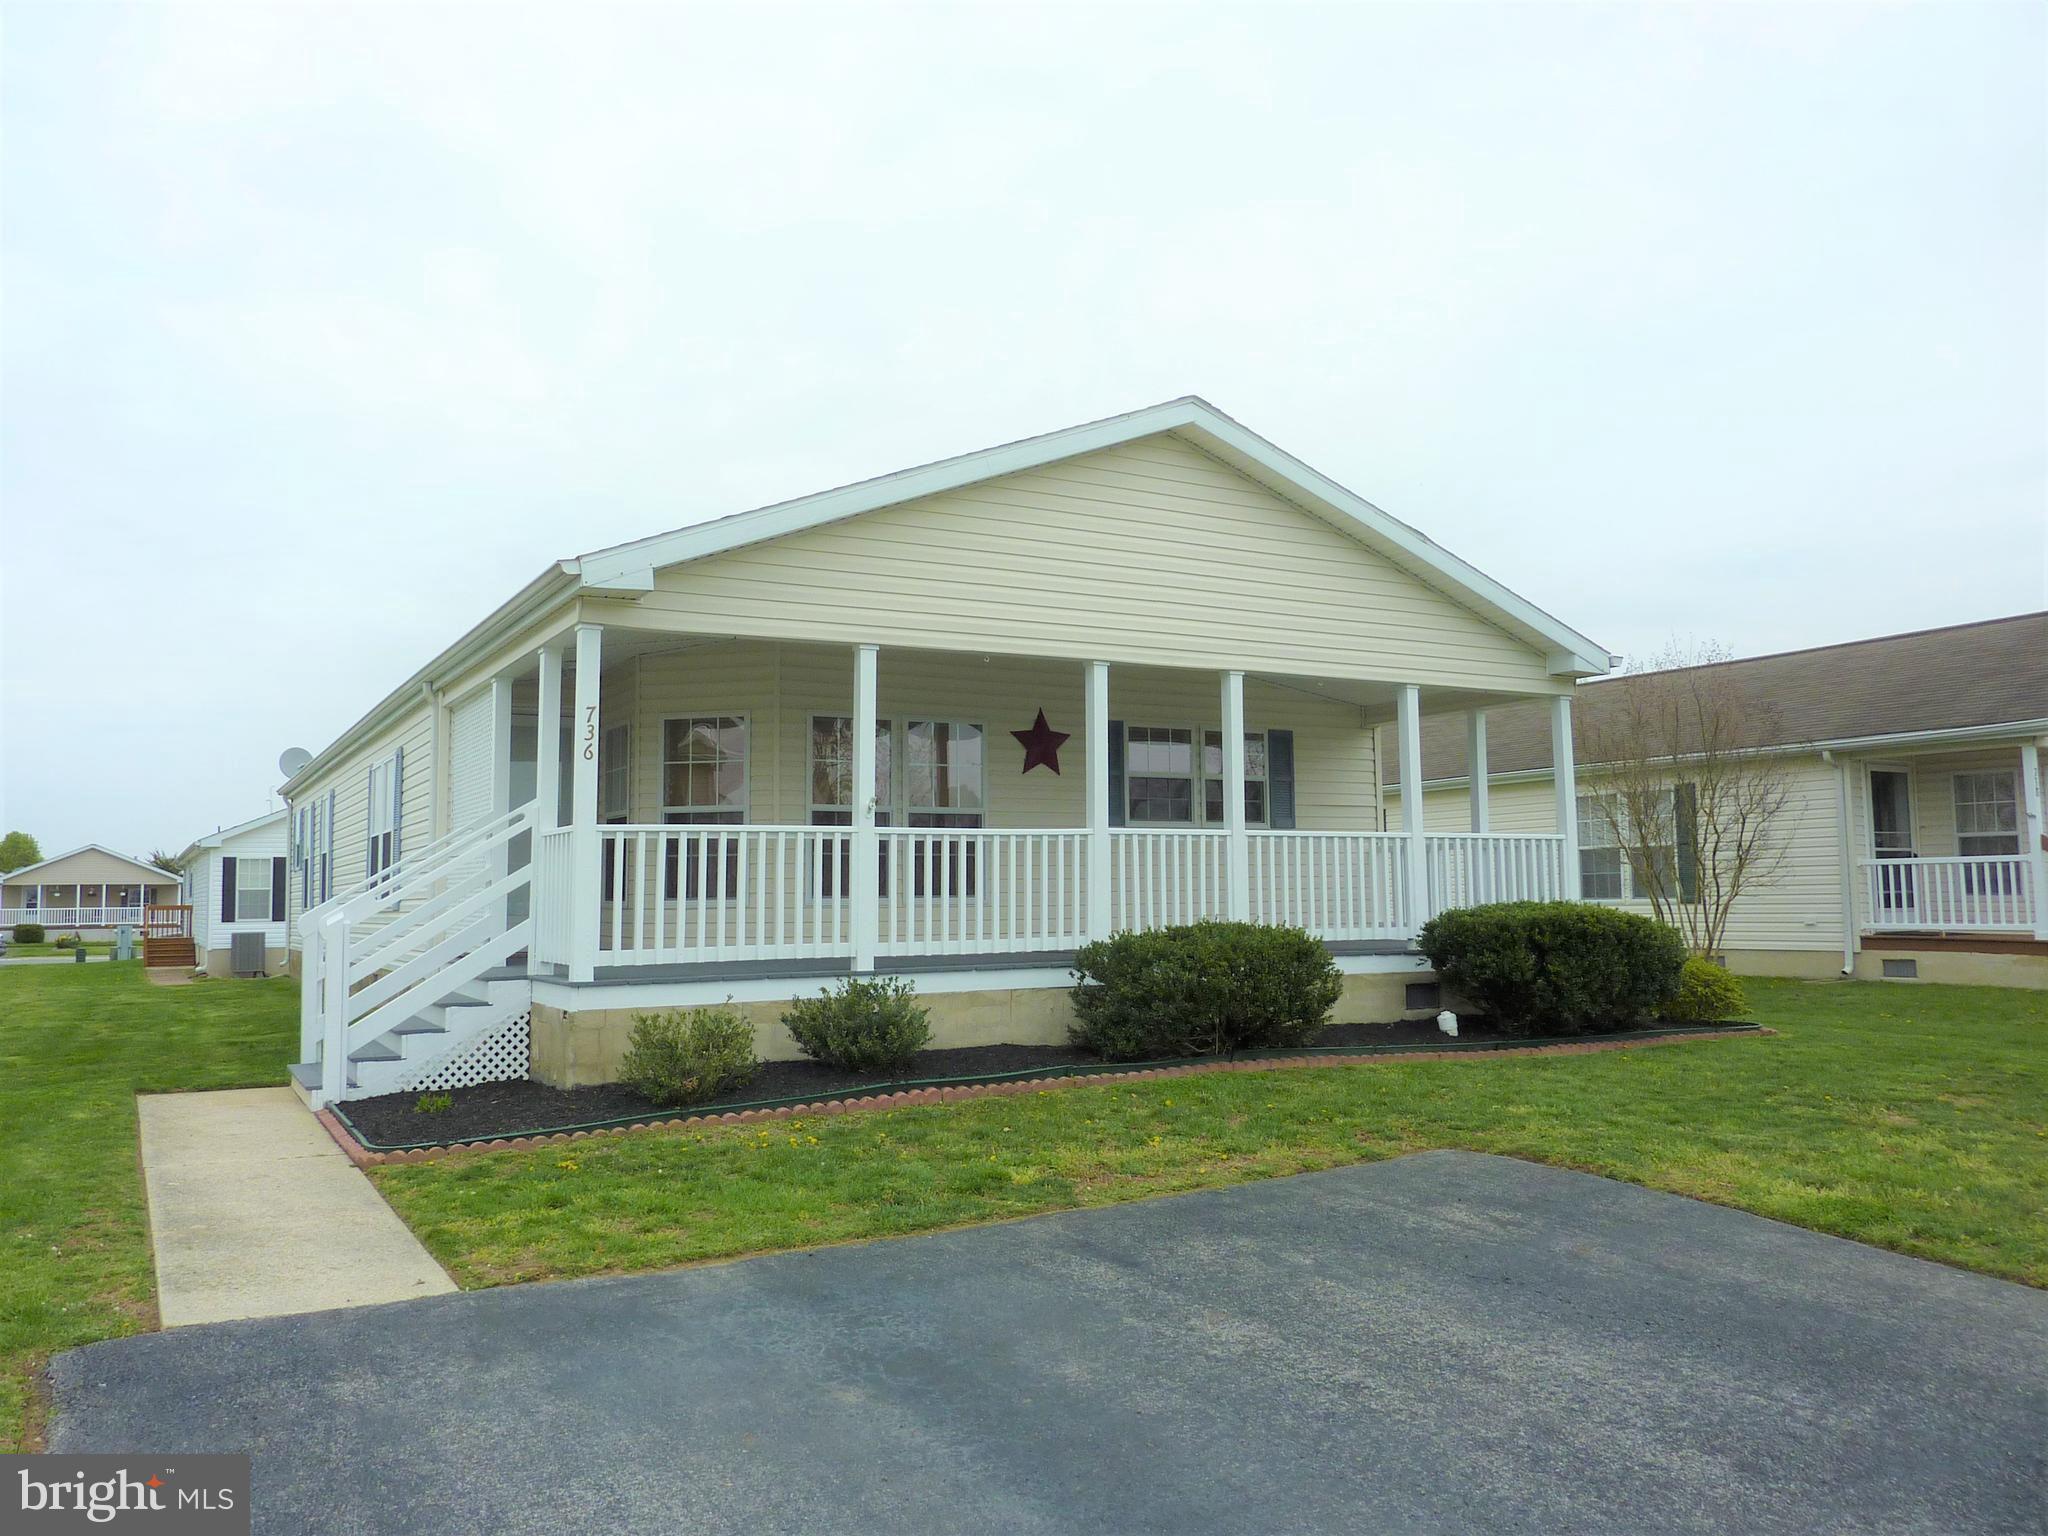 Another Property Sold - 736 Saks Street #66, Smyrna, DE 19977